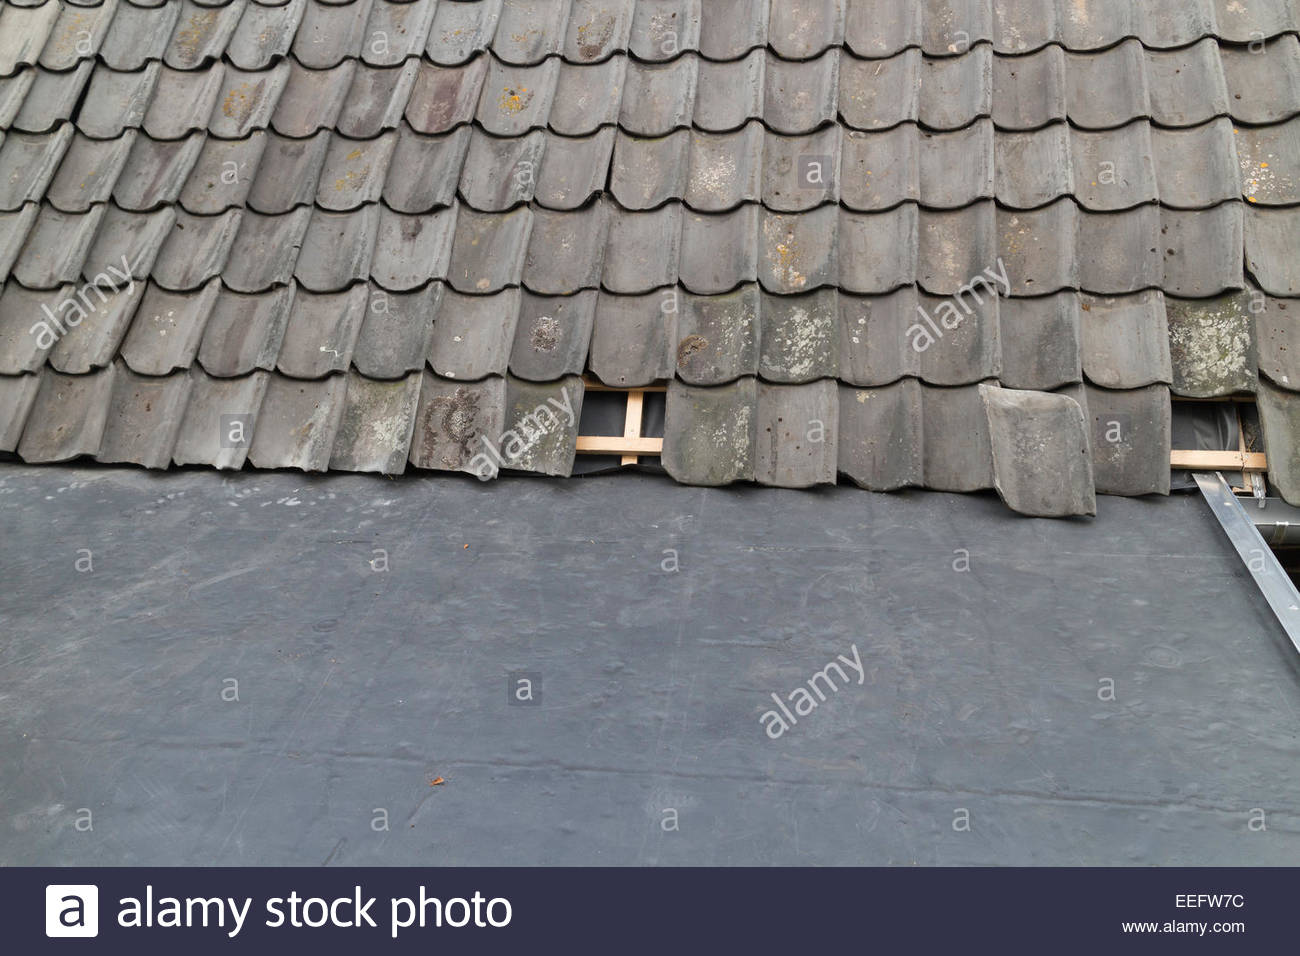 Aluminum Roofing Stock Photos Amp Aluminum Roofing Stock